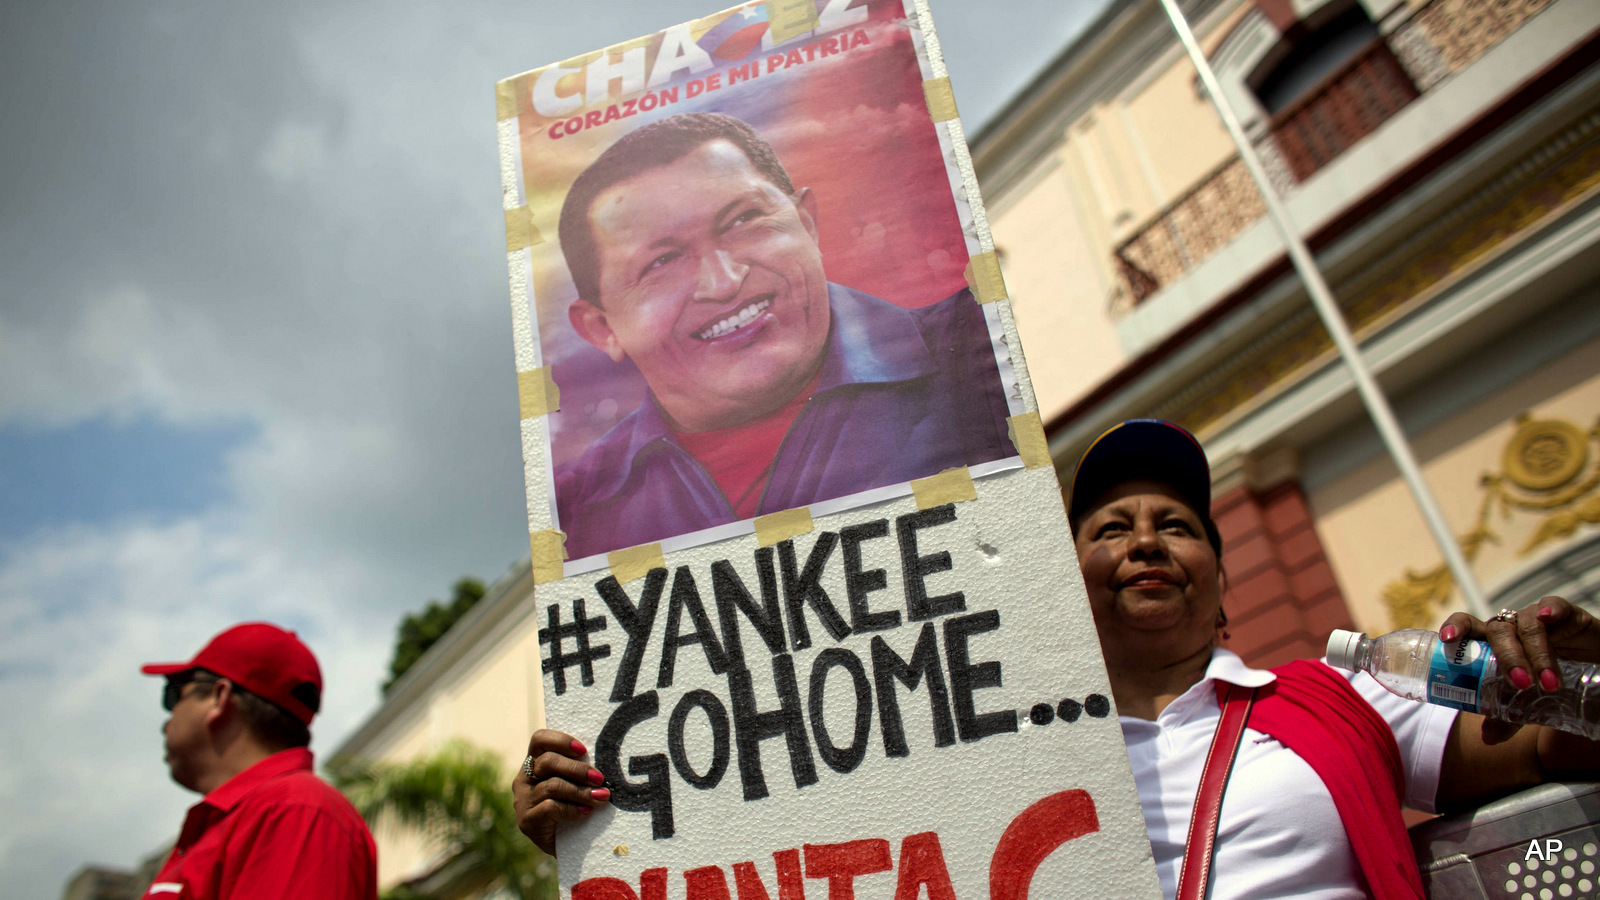 Venezuela Anti Imperialist March